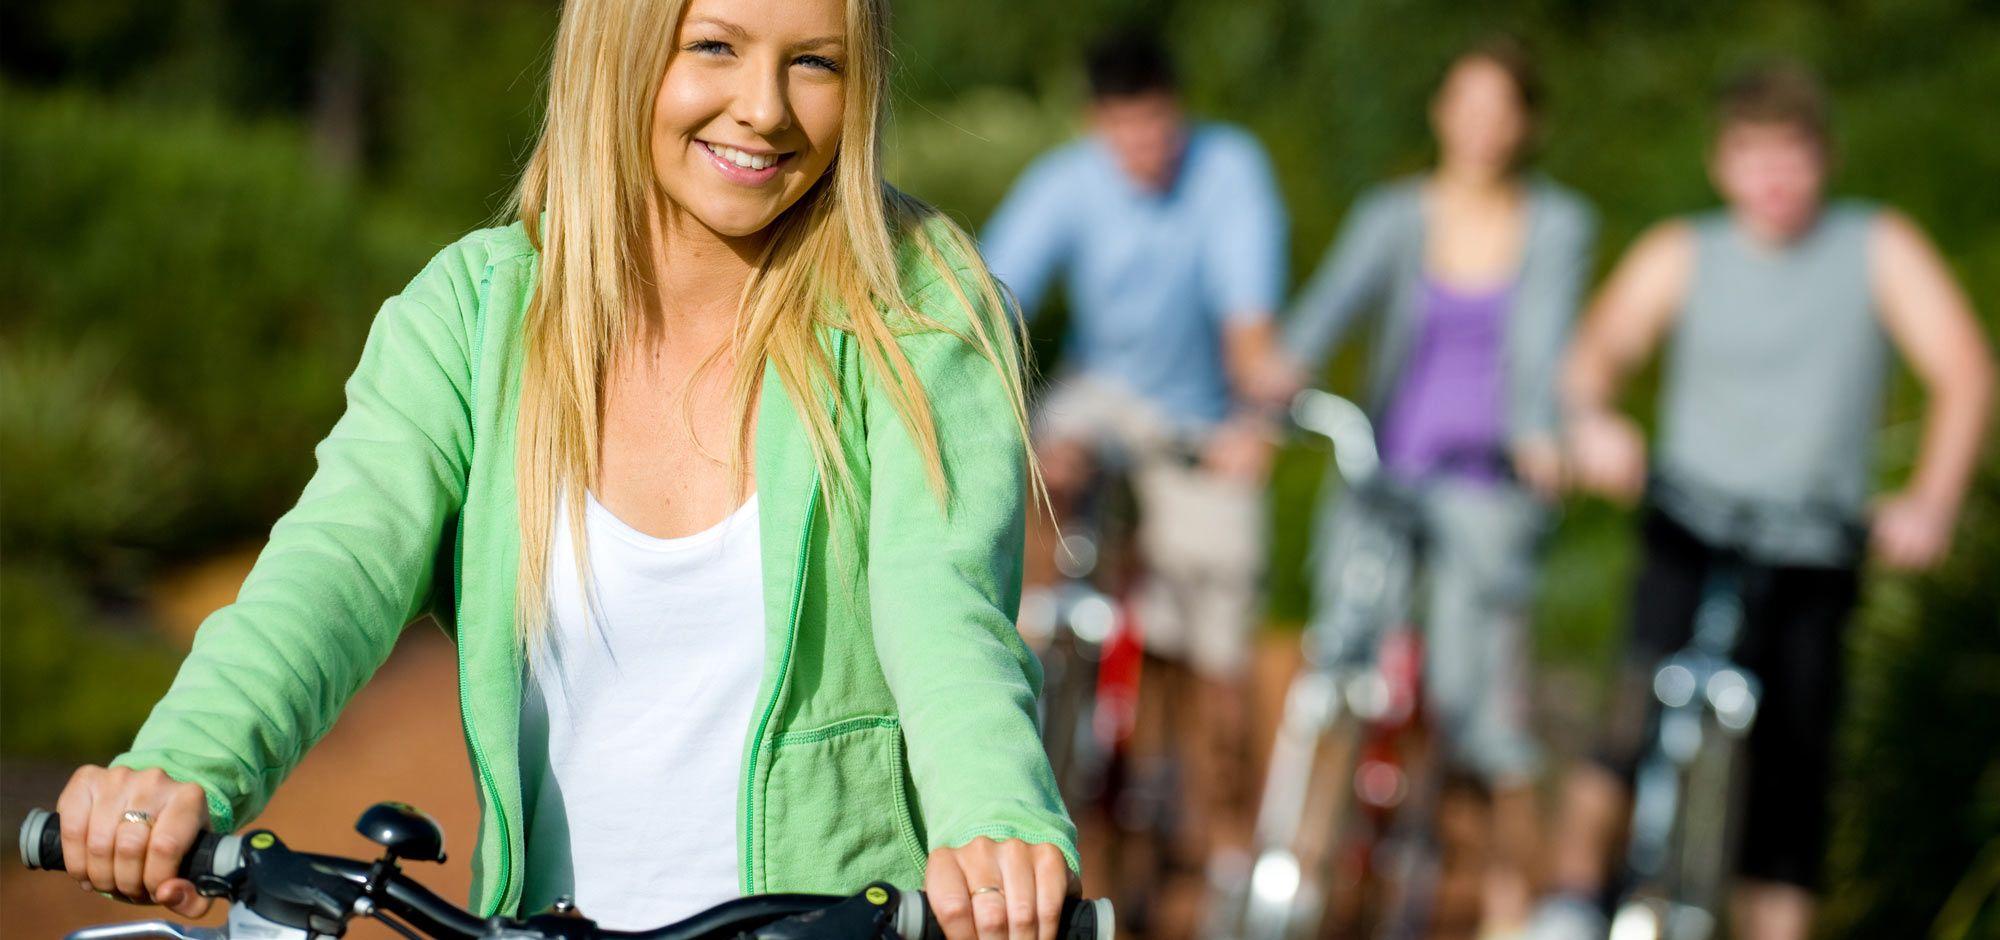 it:Vacanze attive|fr:Vacances actives|en:Holidays active|de:aktiv-Urlaub